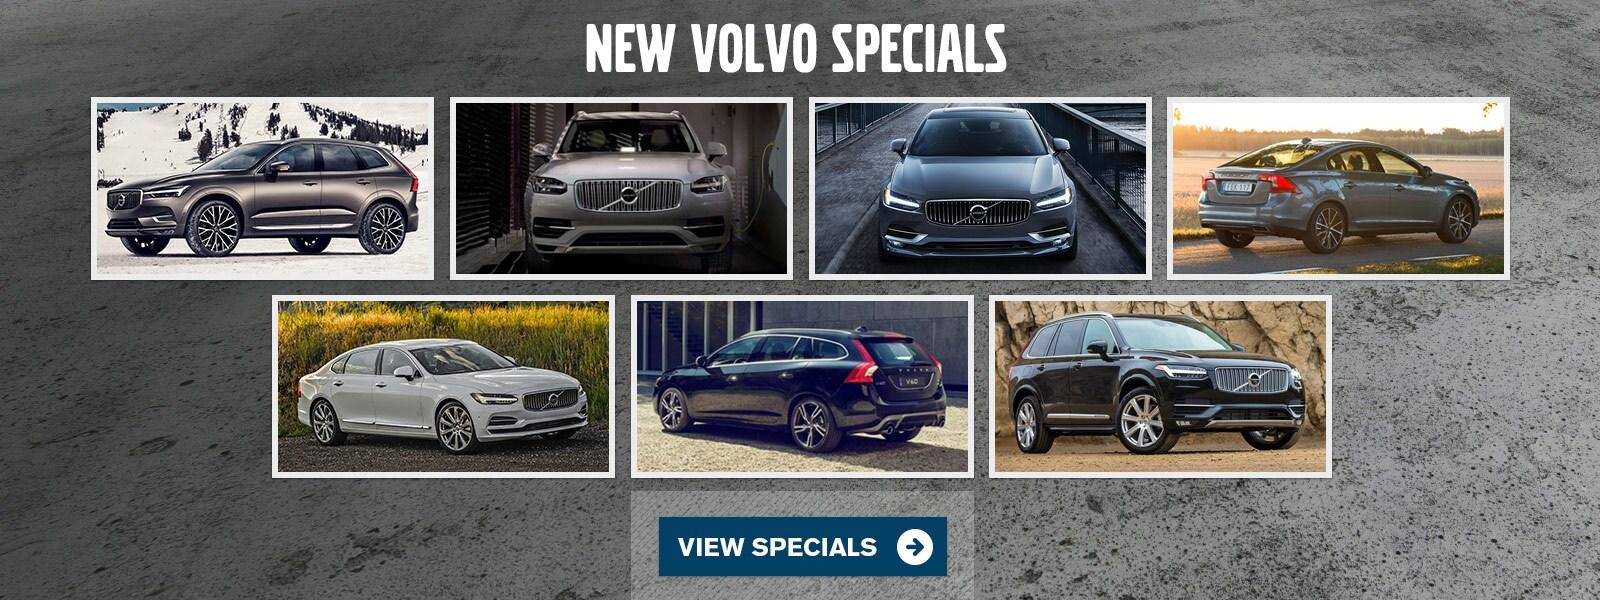 Volvo Cars Of Louisville Volvo Dealer Louisville KY - Cool cars louisville ky